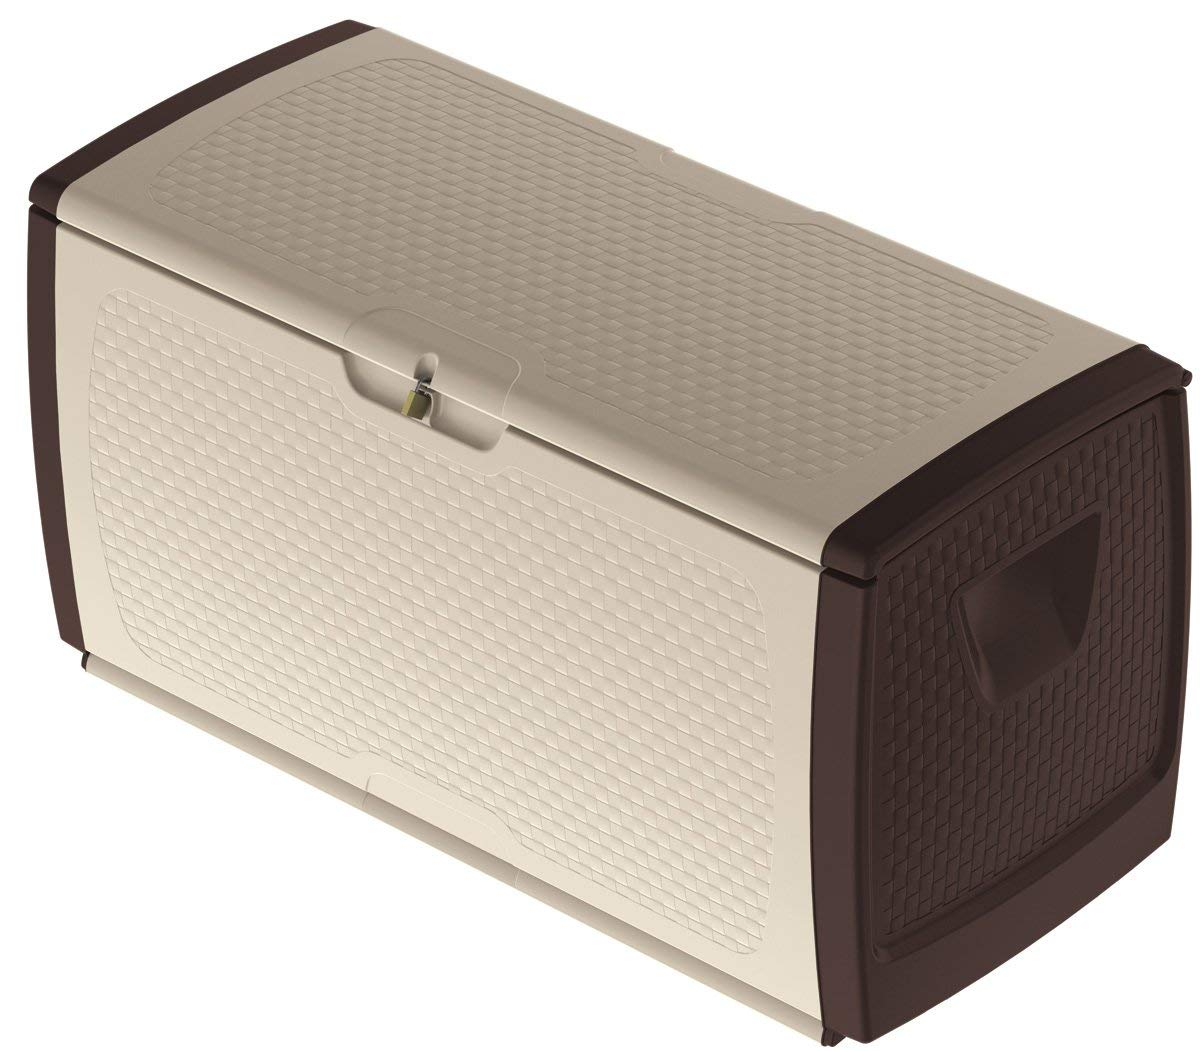 Cassapanca Box Porta Legno Legna Baule Lgv Shopping